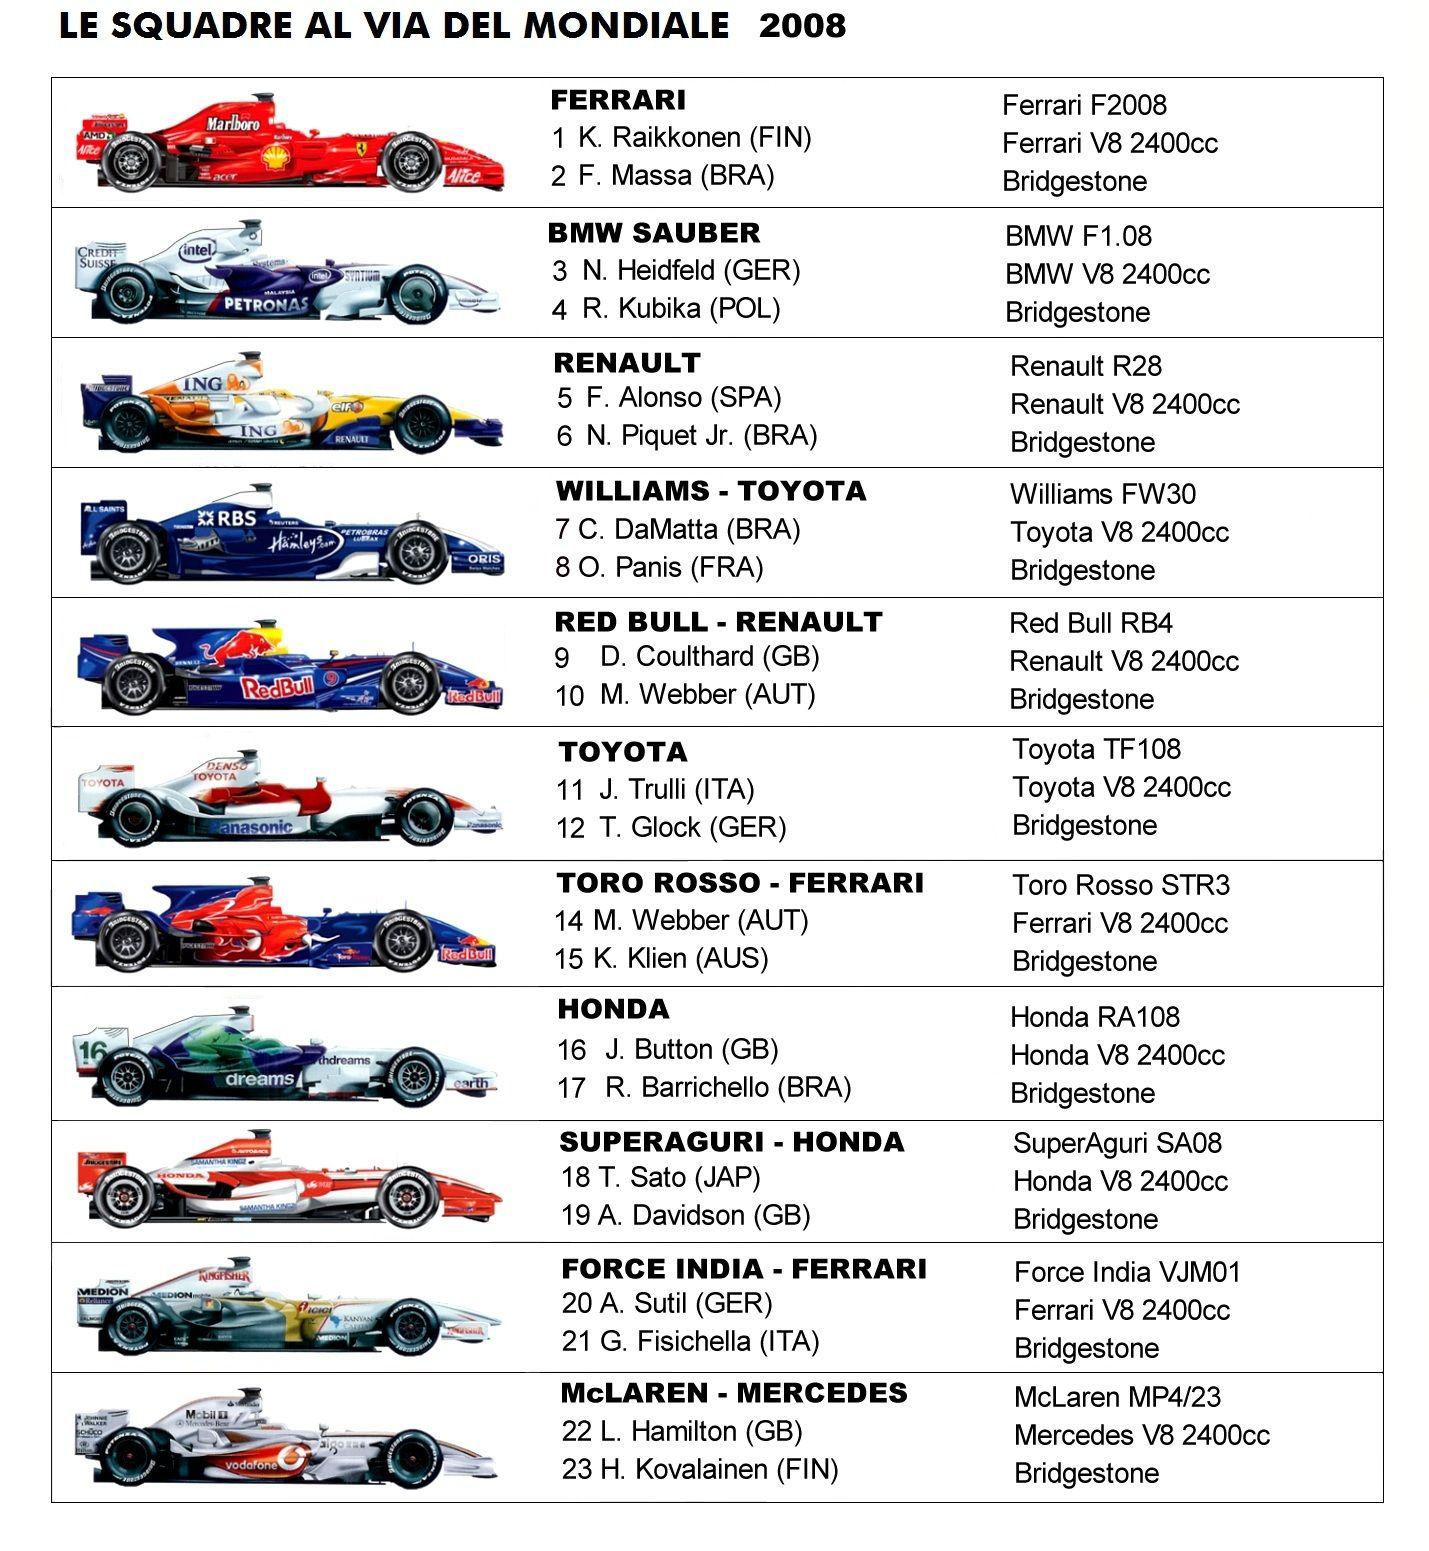 monoposto formula 1 2008